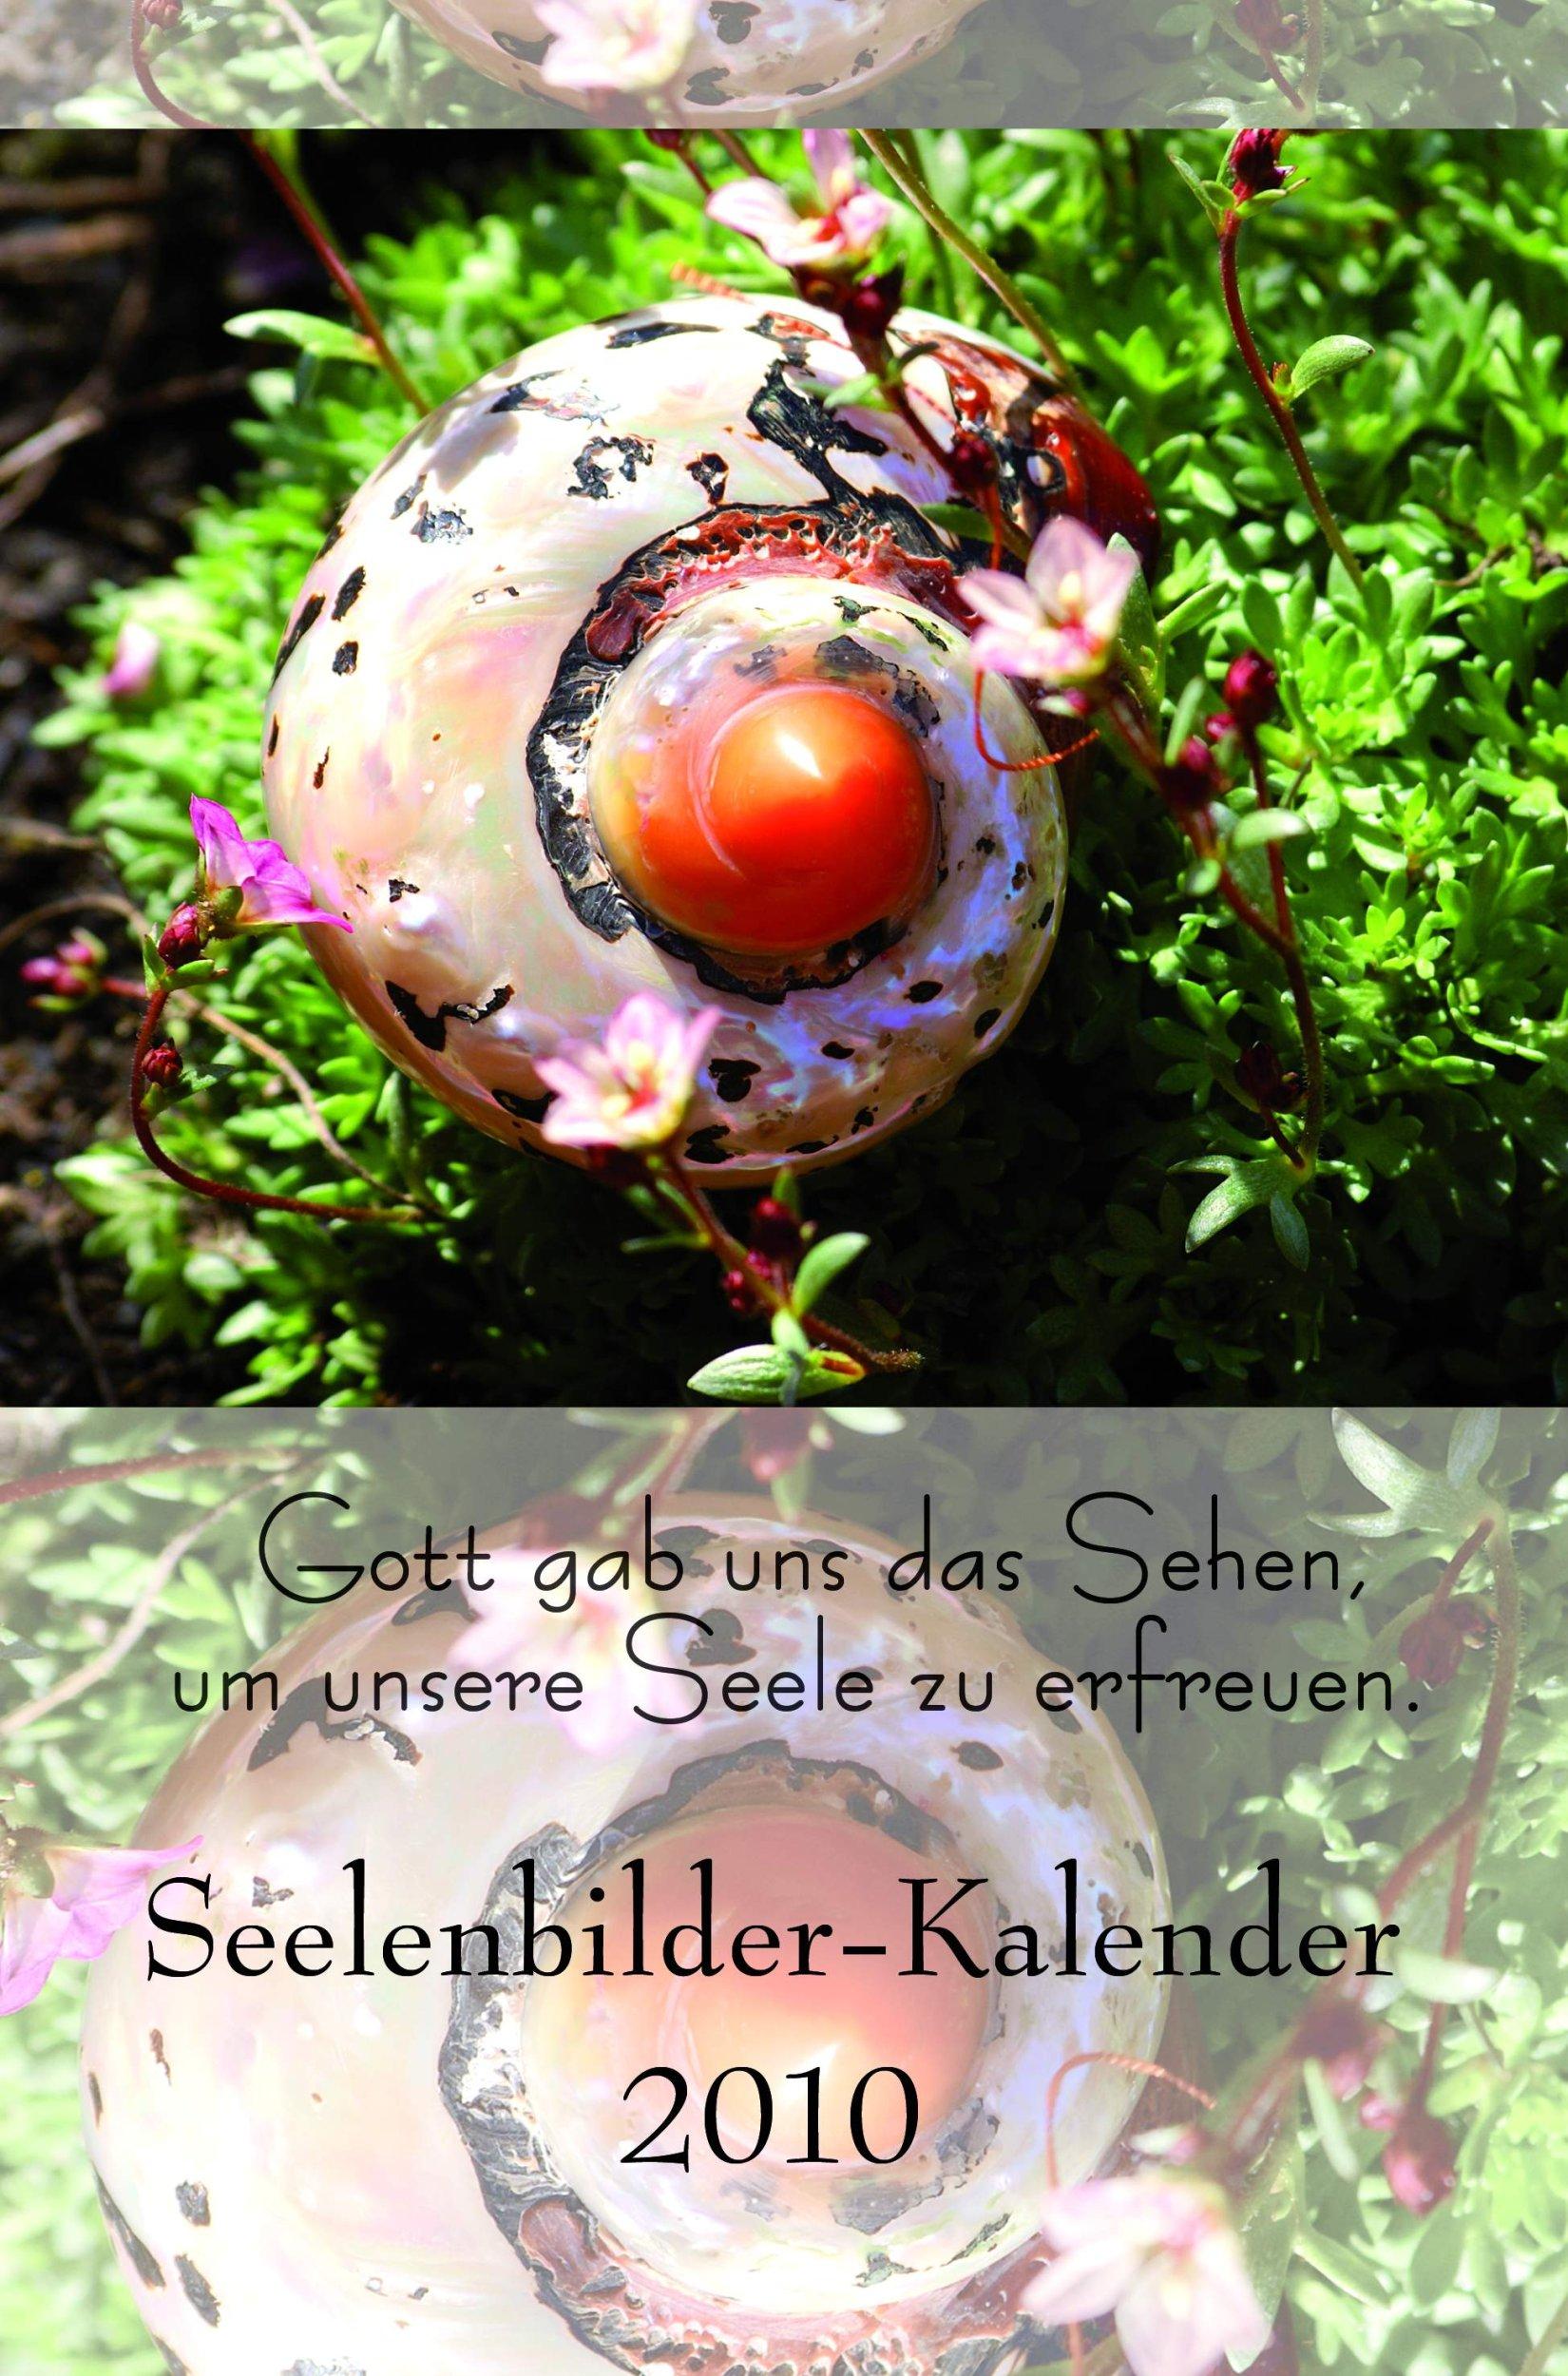 Seelenbilder-Kalender 2010